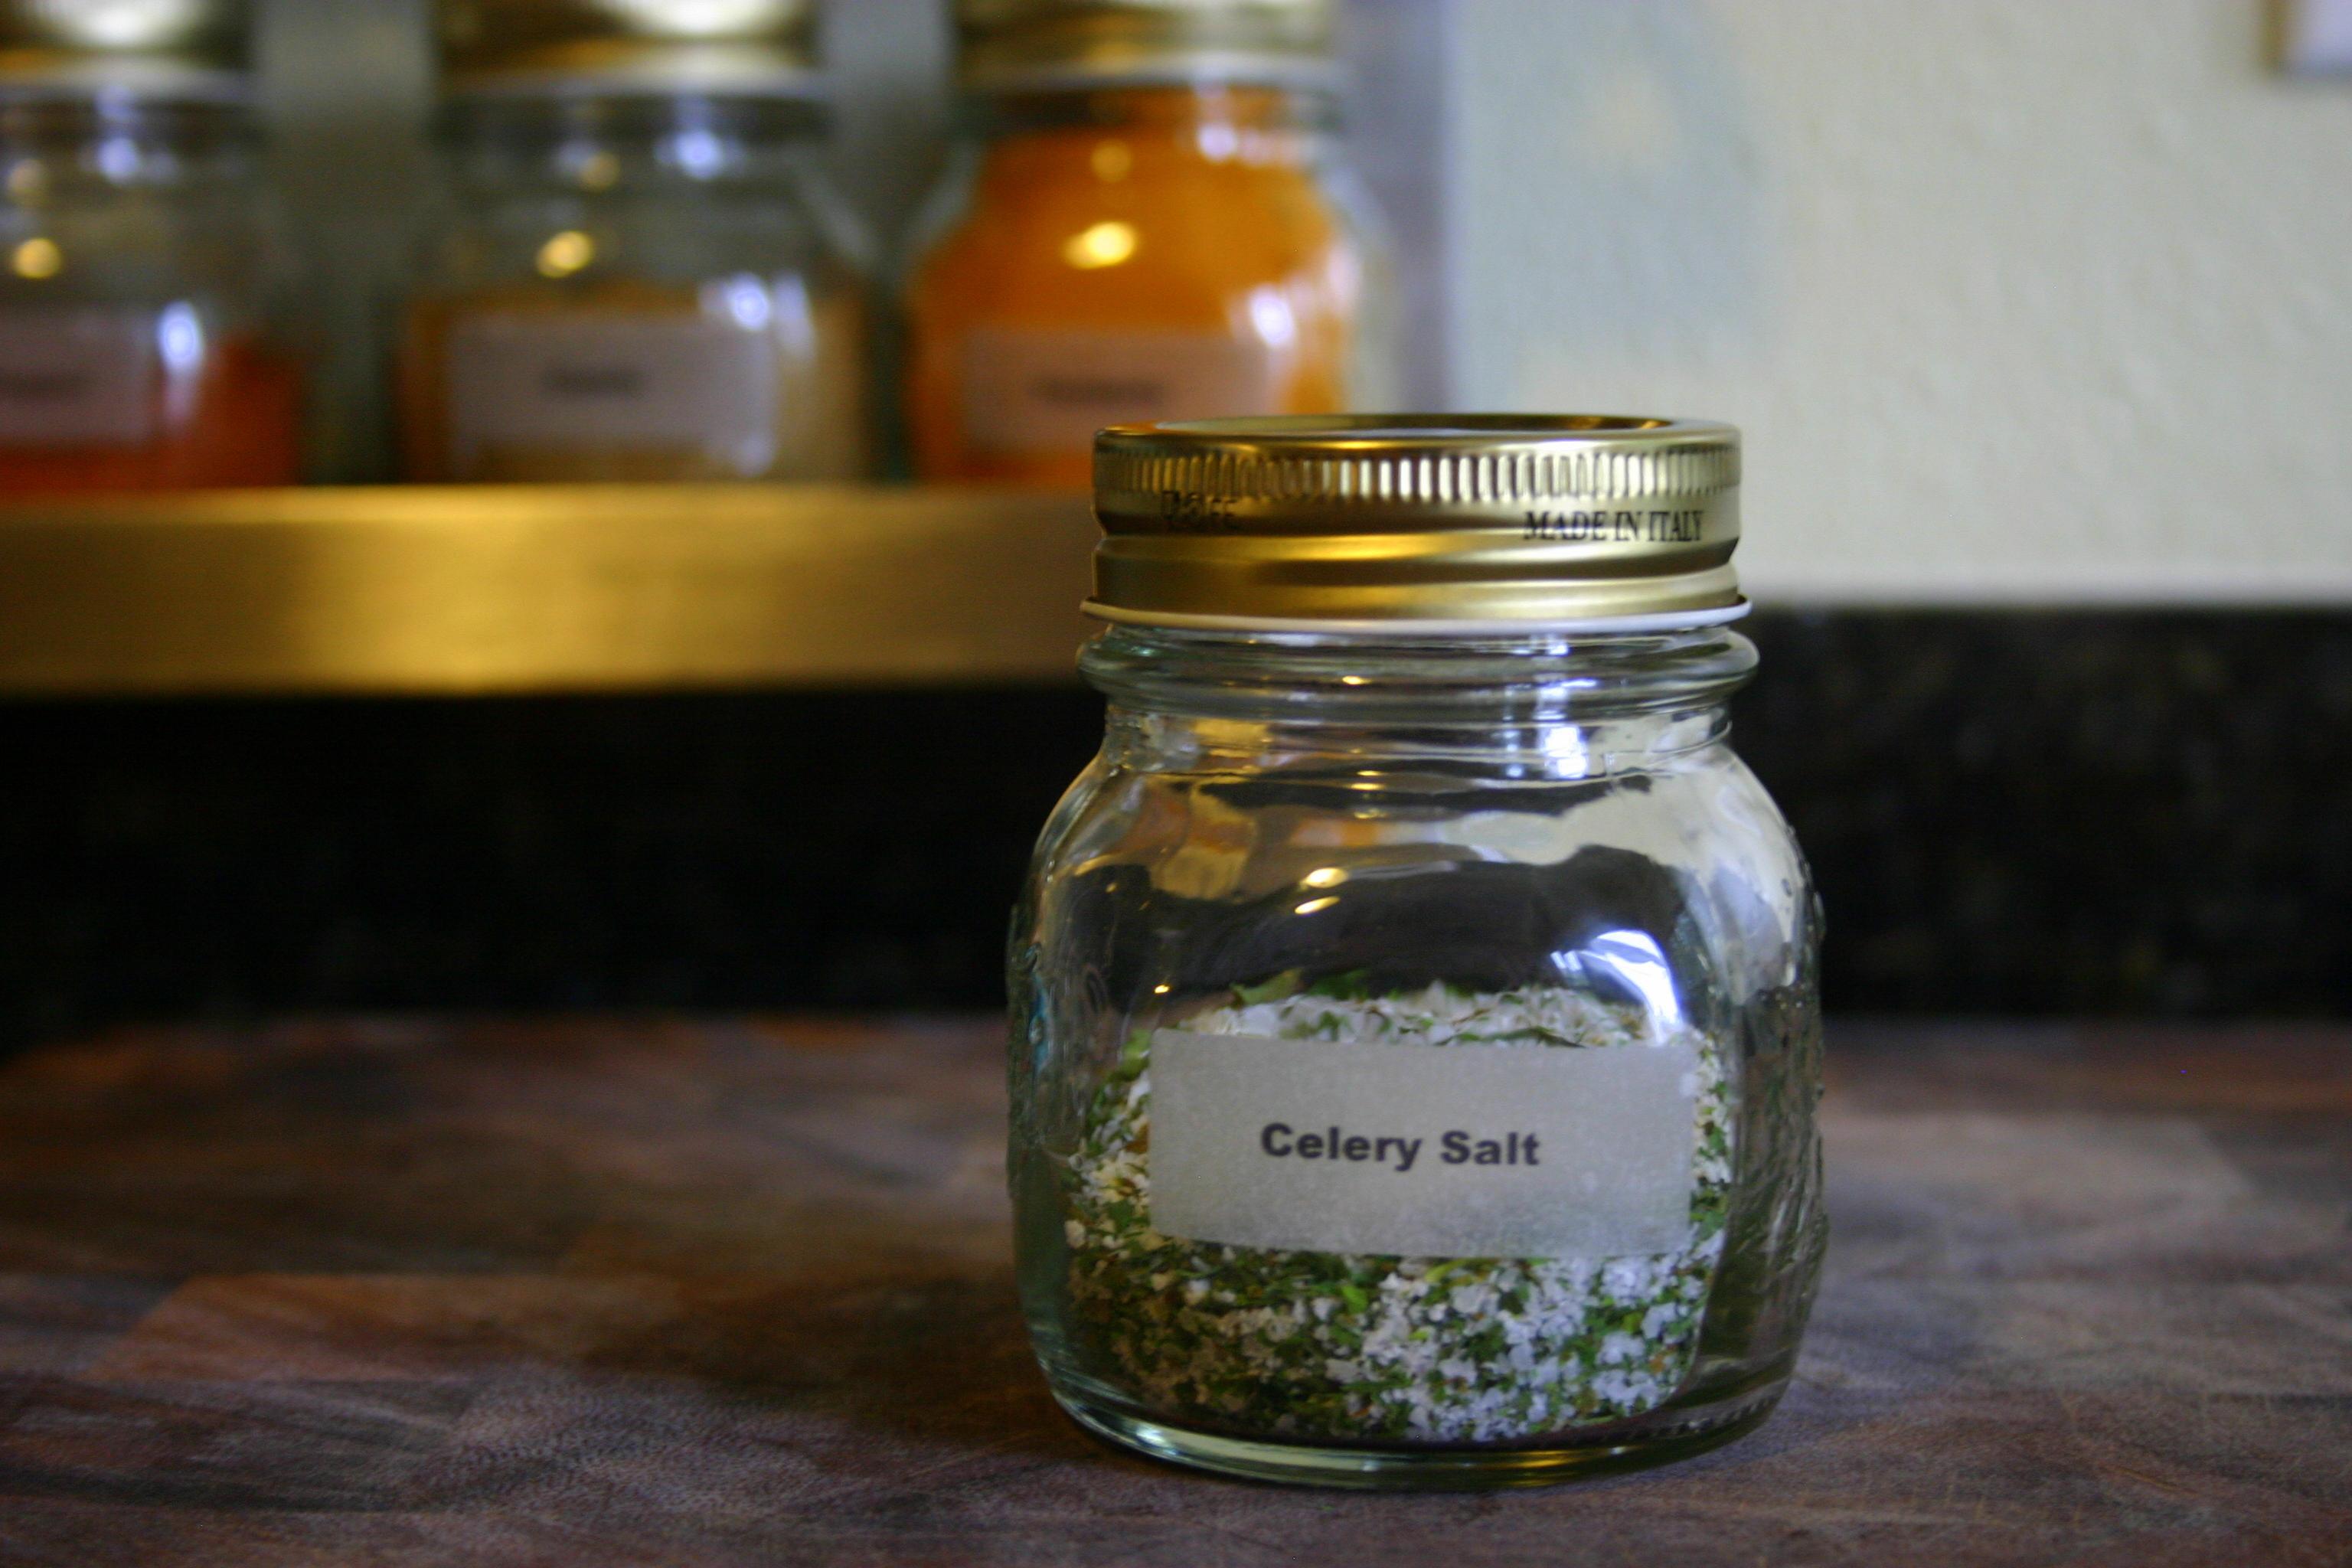 ... celery salt crusted baked potato recipe on food52 homemade celery salt